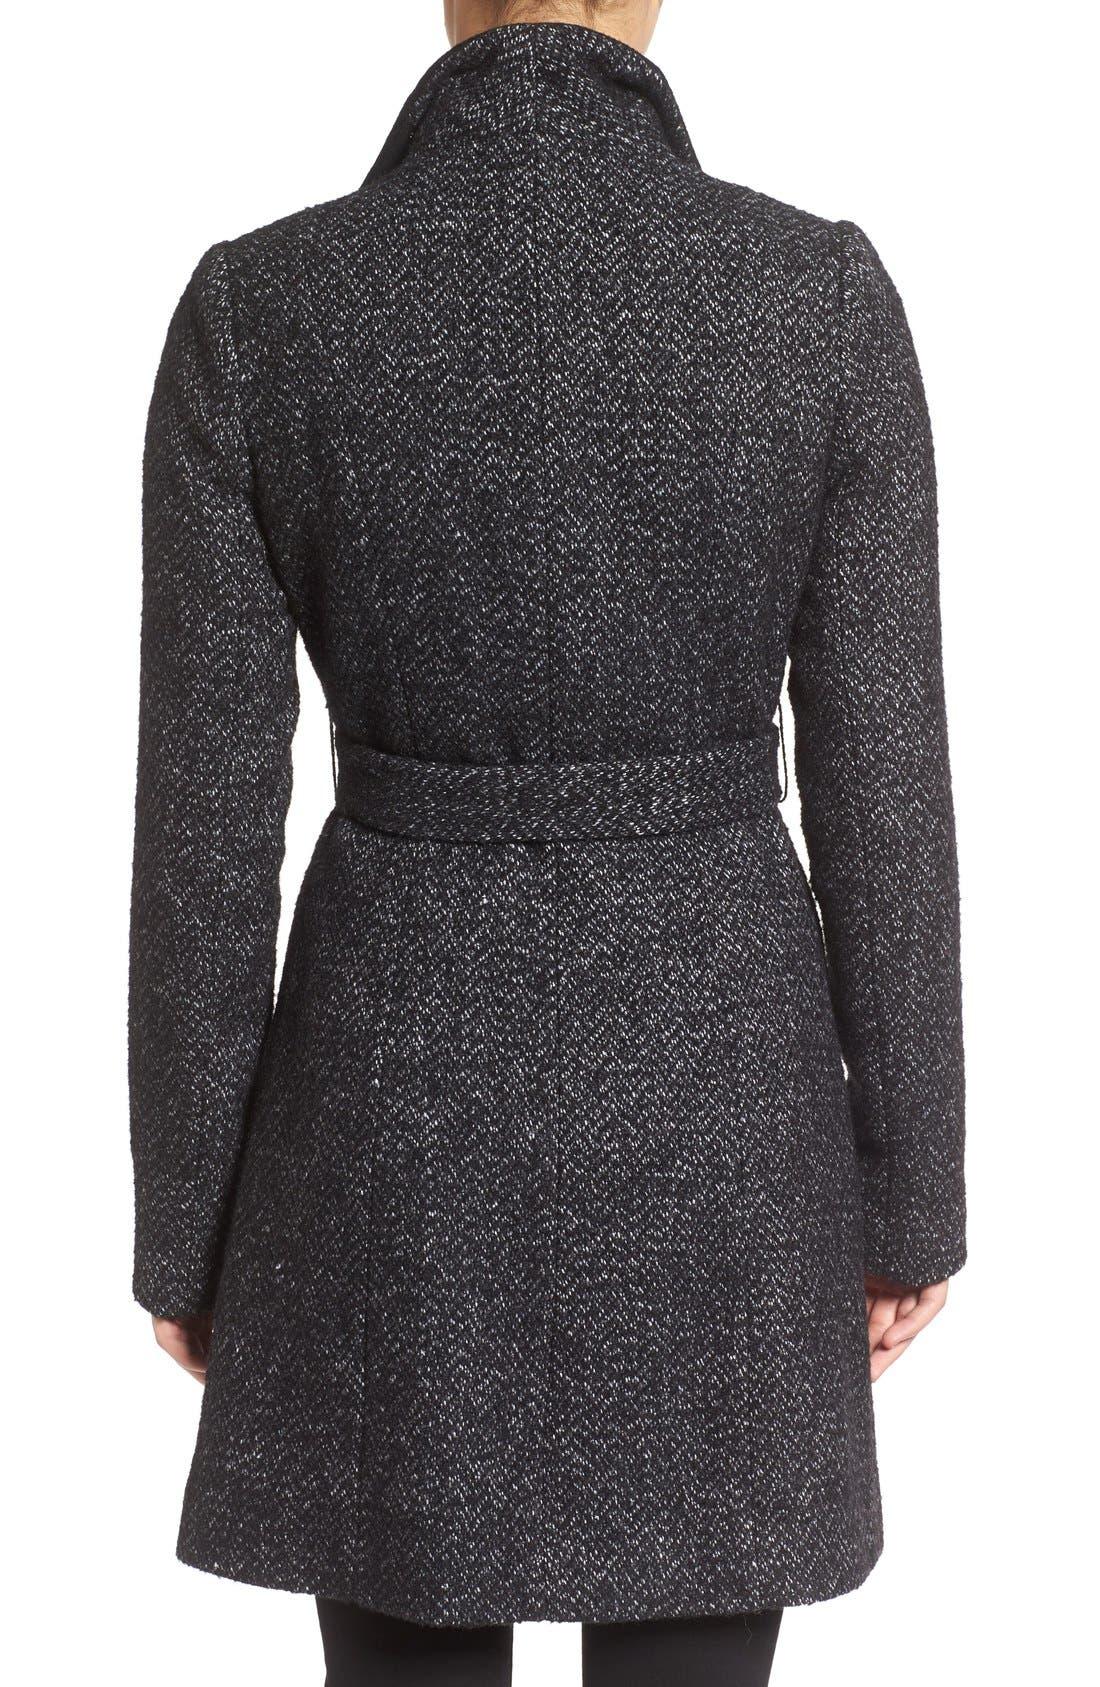 'Eva' Belted Tweed Jacket,                             Alternate thumbnail 2, color,                             008